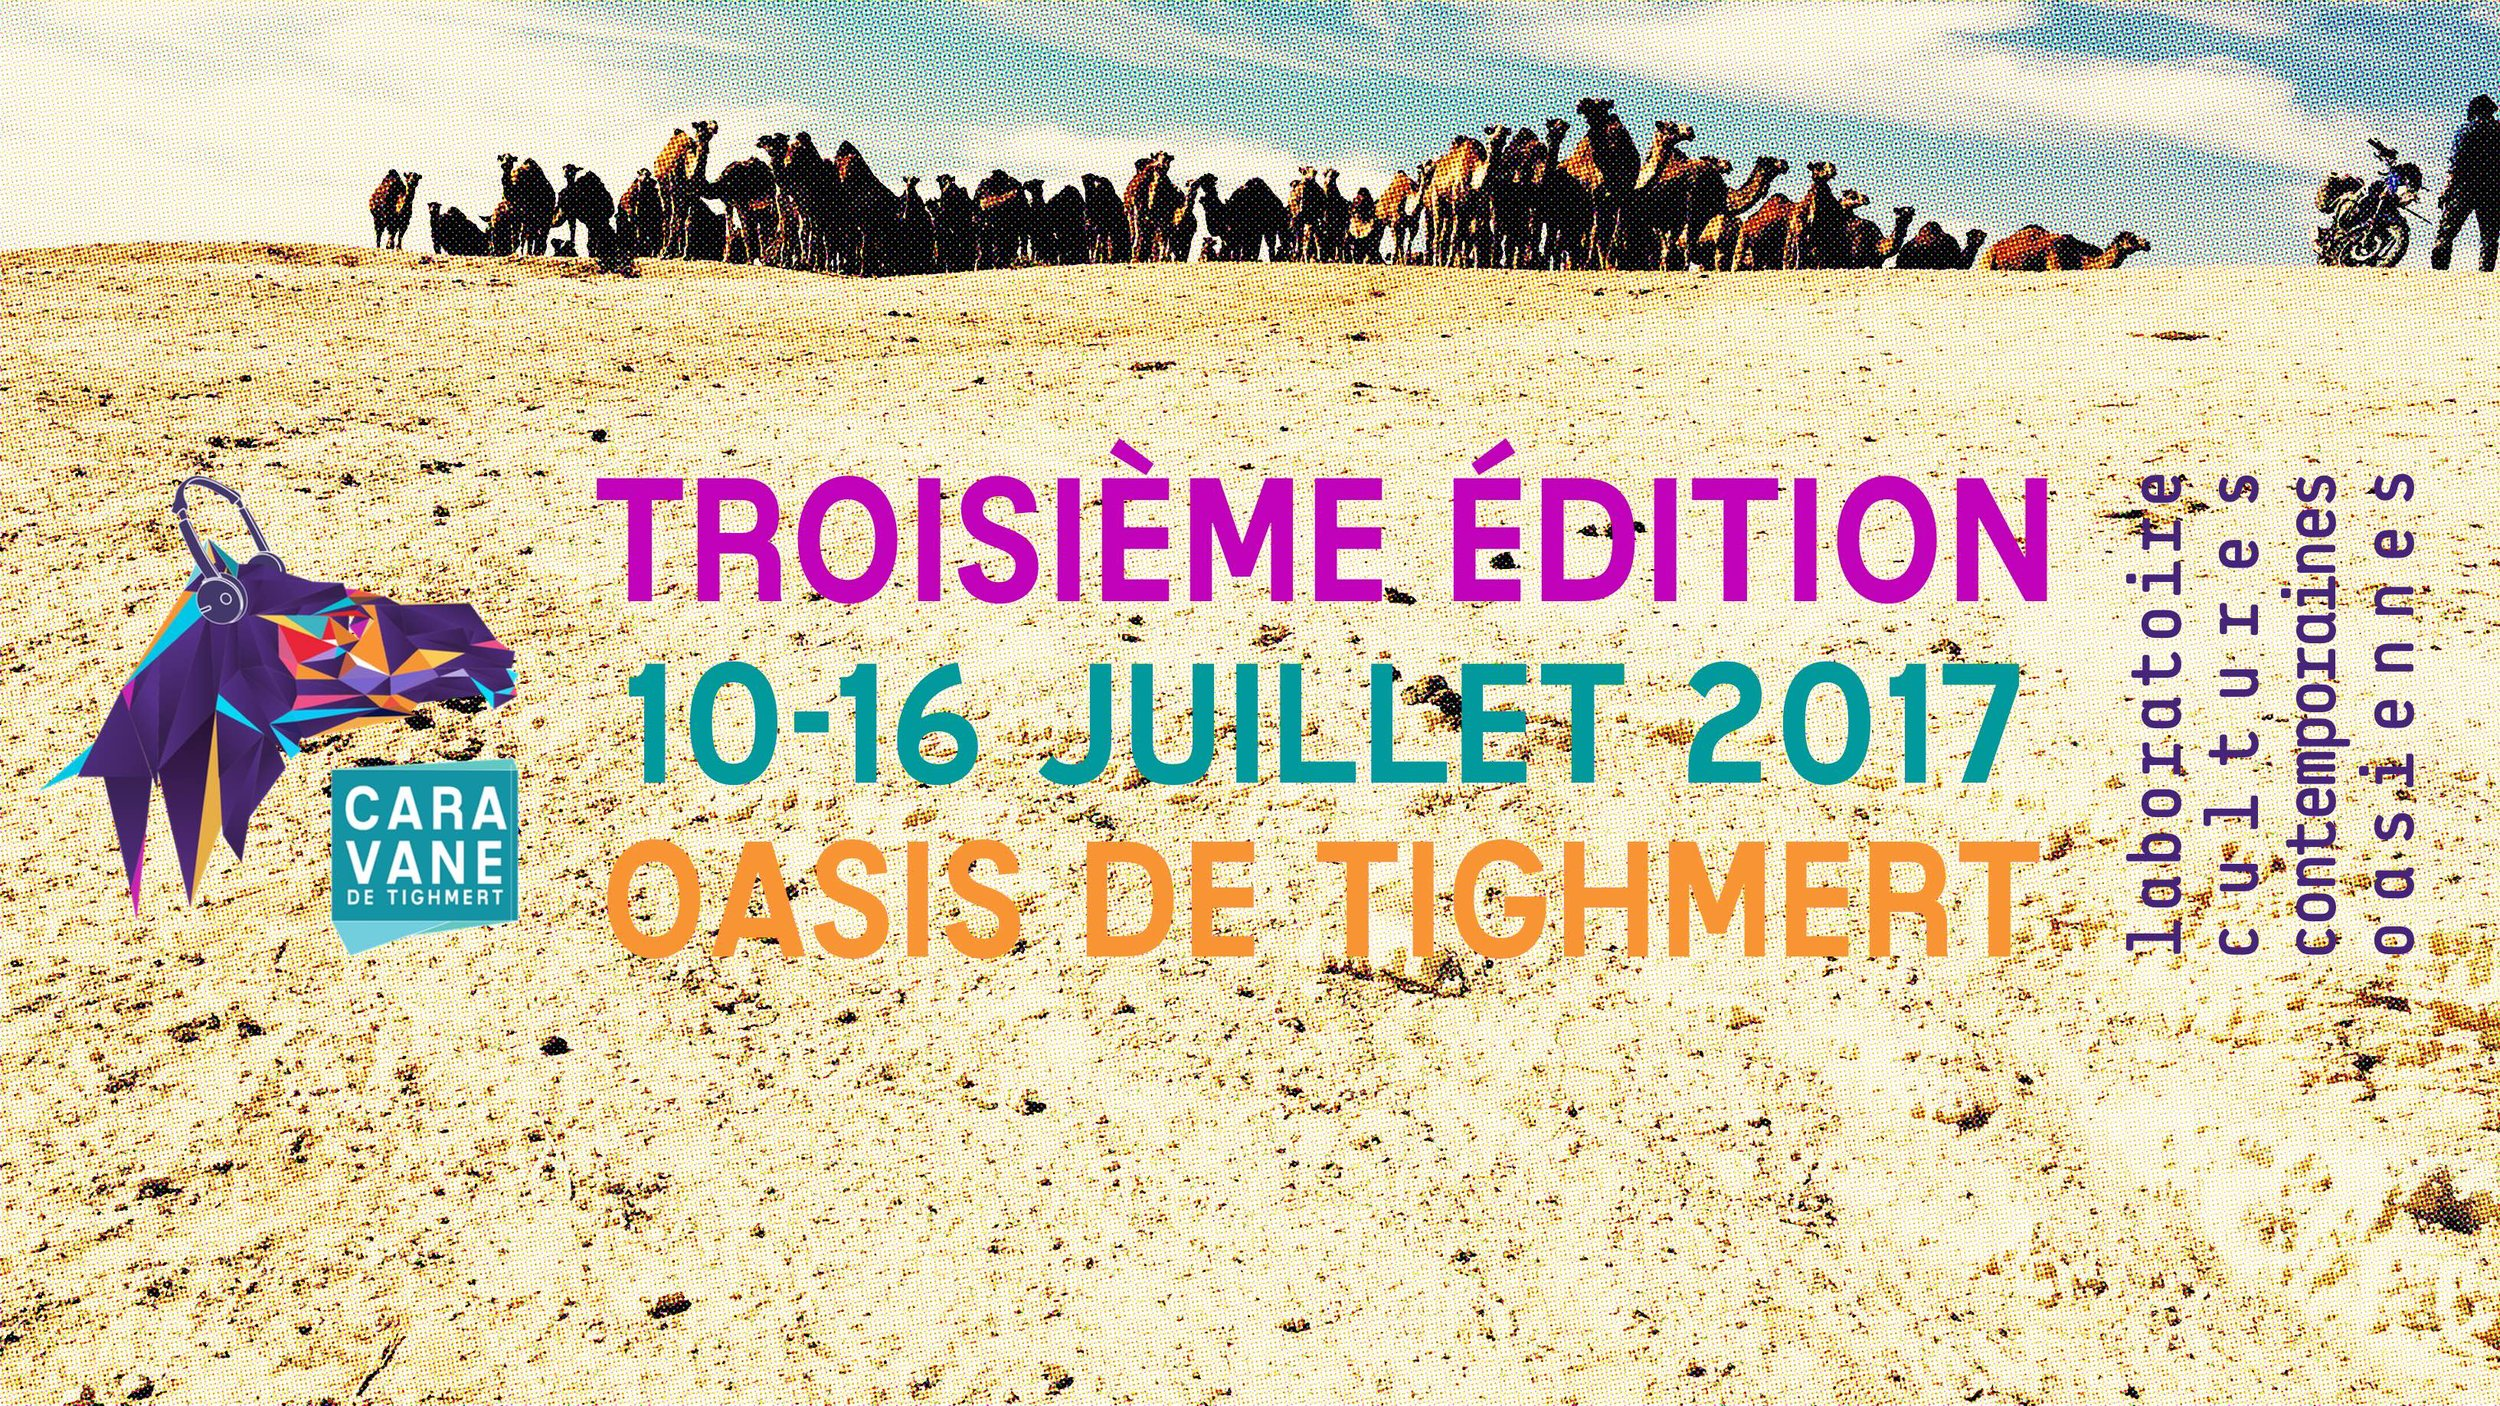 CARAVANE TIGHMERT 2017  affiche 01.jpg